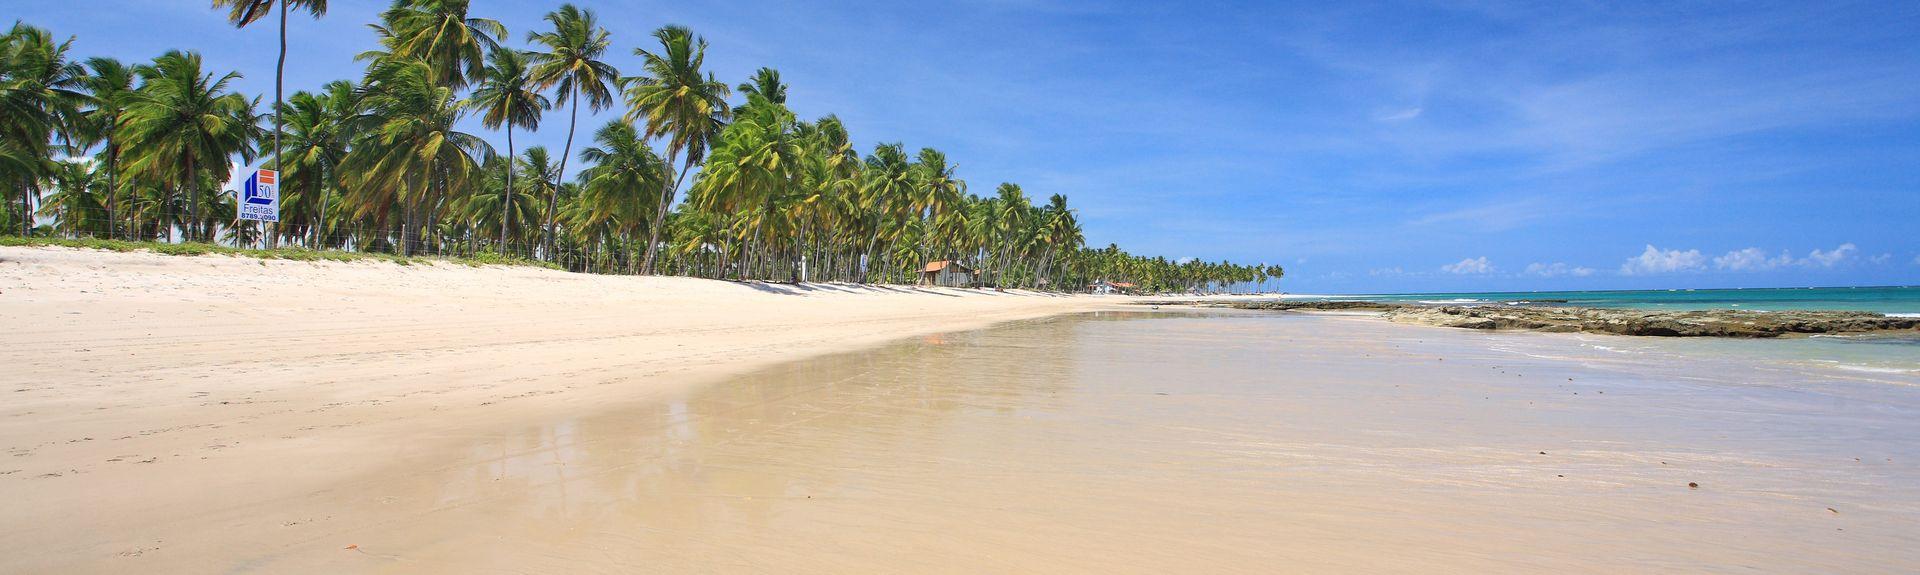 São José da Coroa Grande, Pernambuco, Brasil